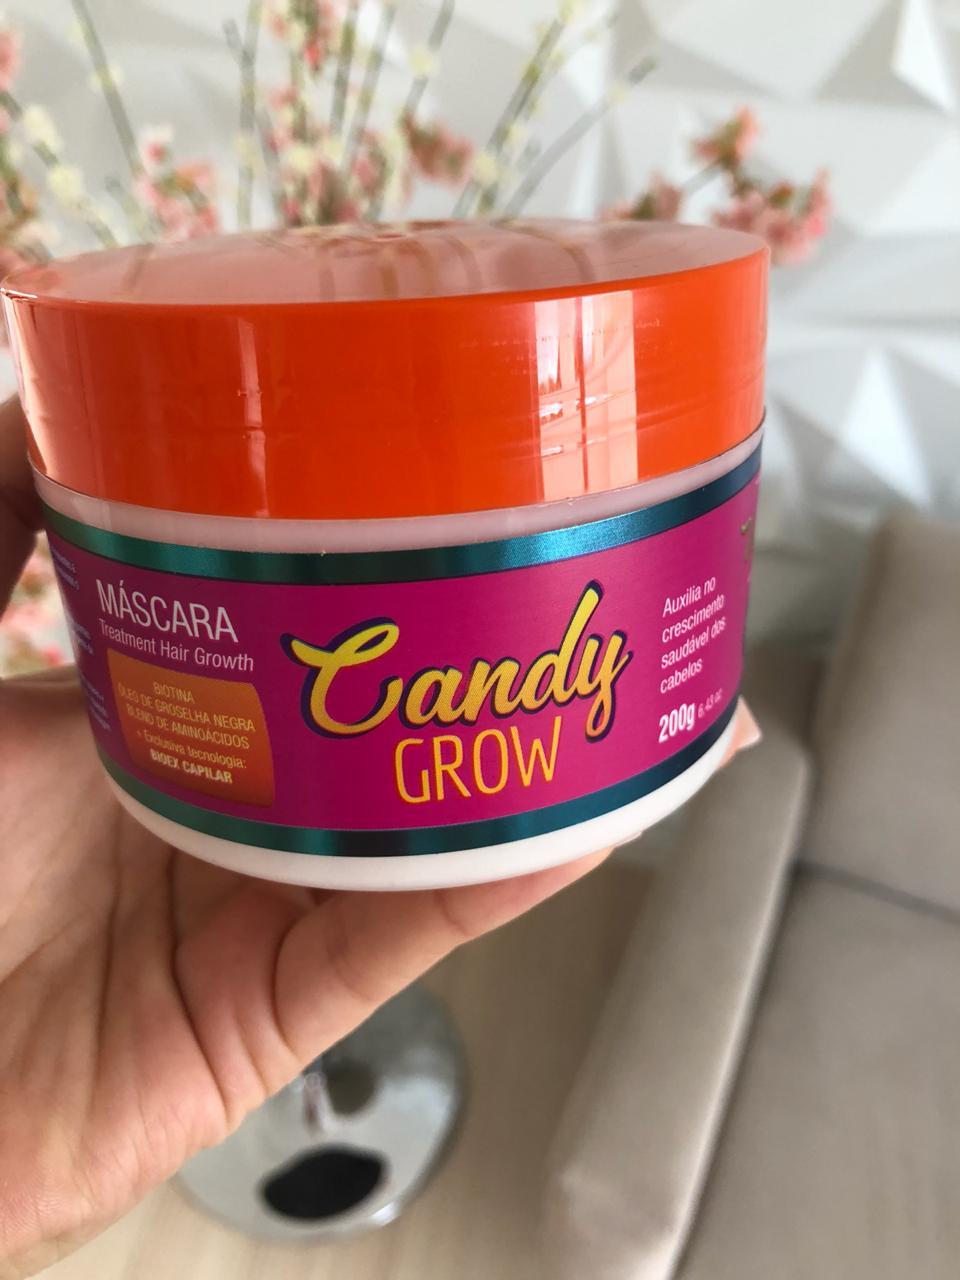 linha-candy-grow-phinna-cosmeticos-e-boa -resenha-mascara